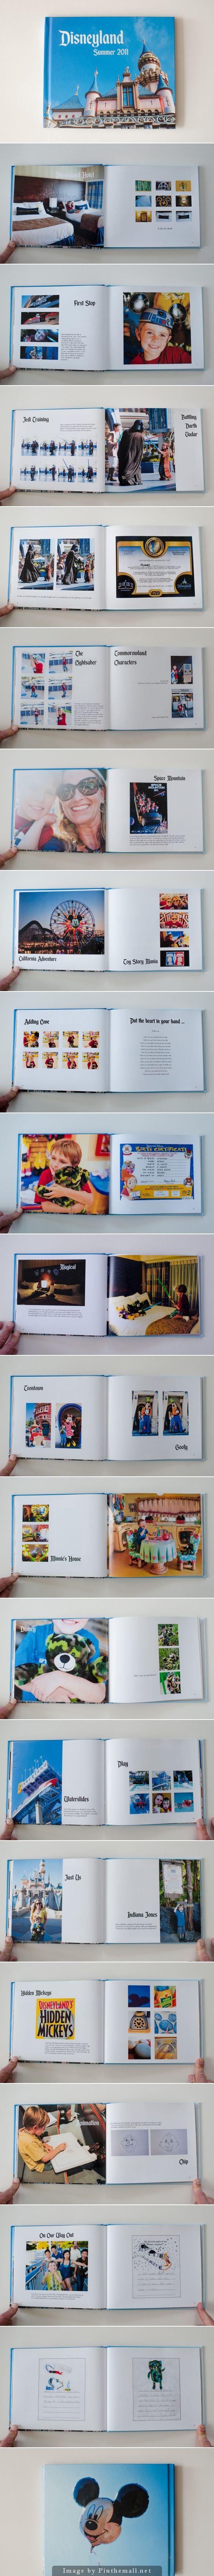 Vacation photo book